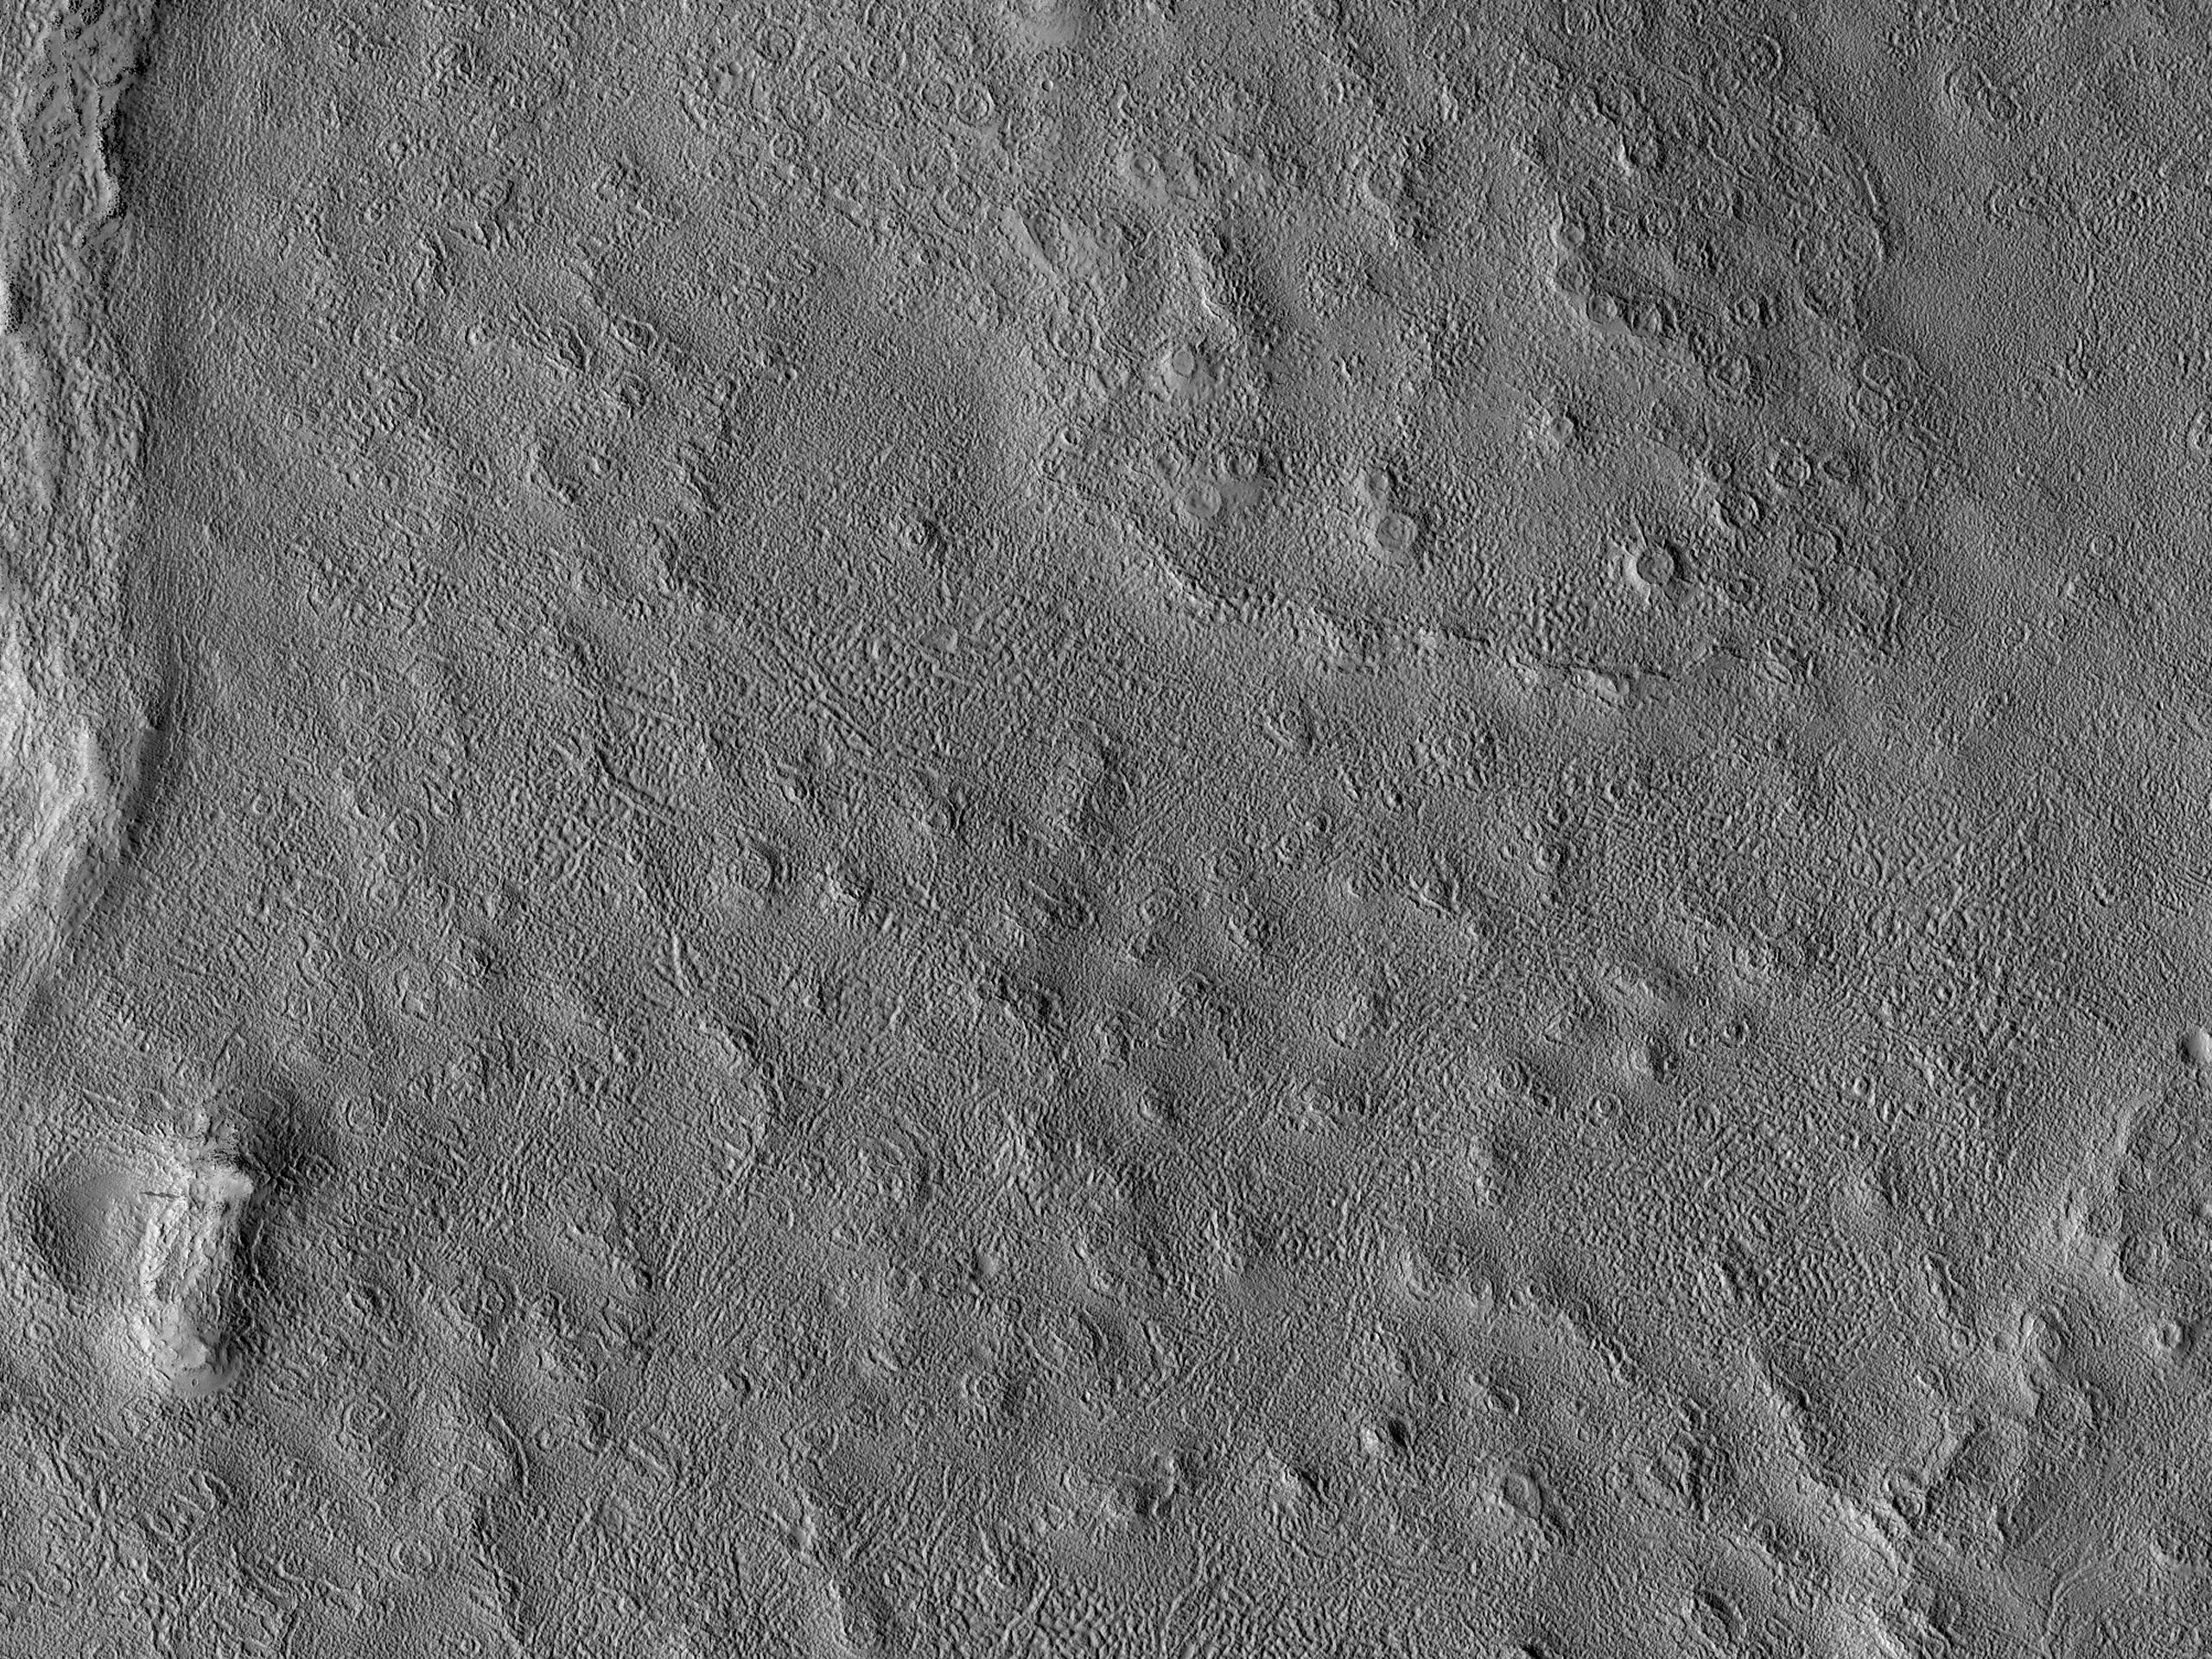 Terrain in the Phlegra Region